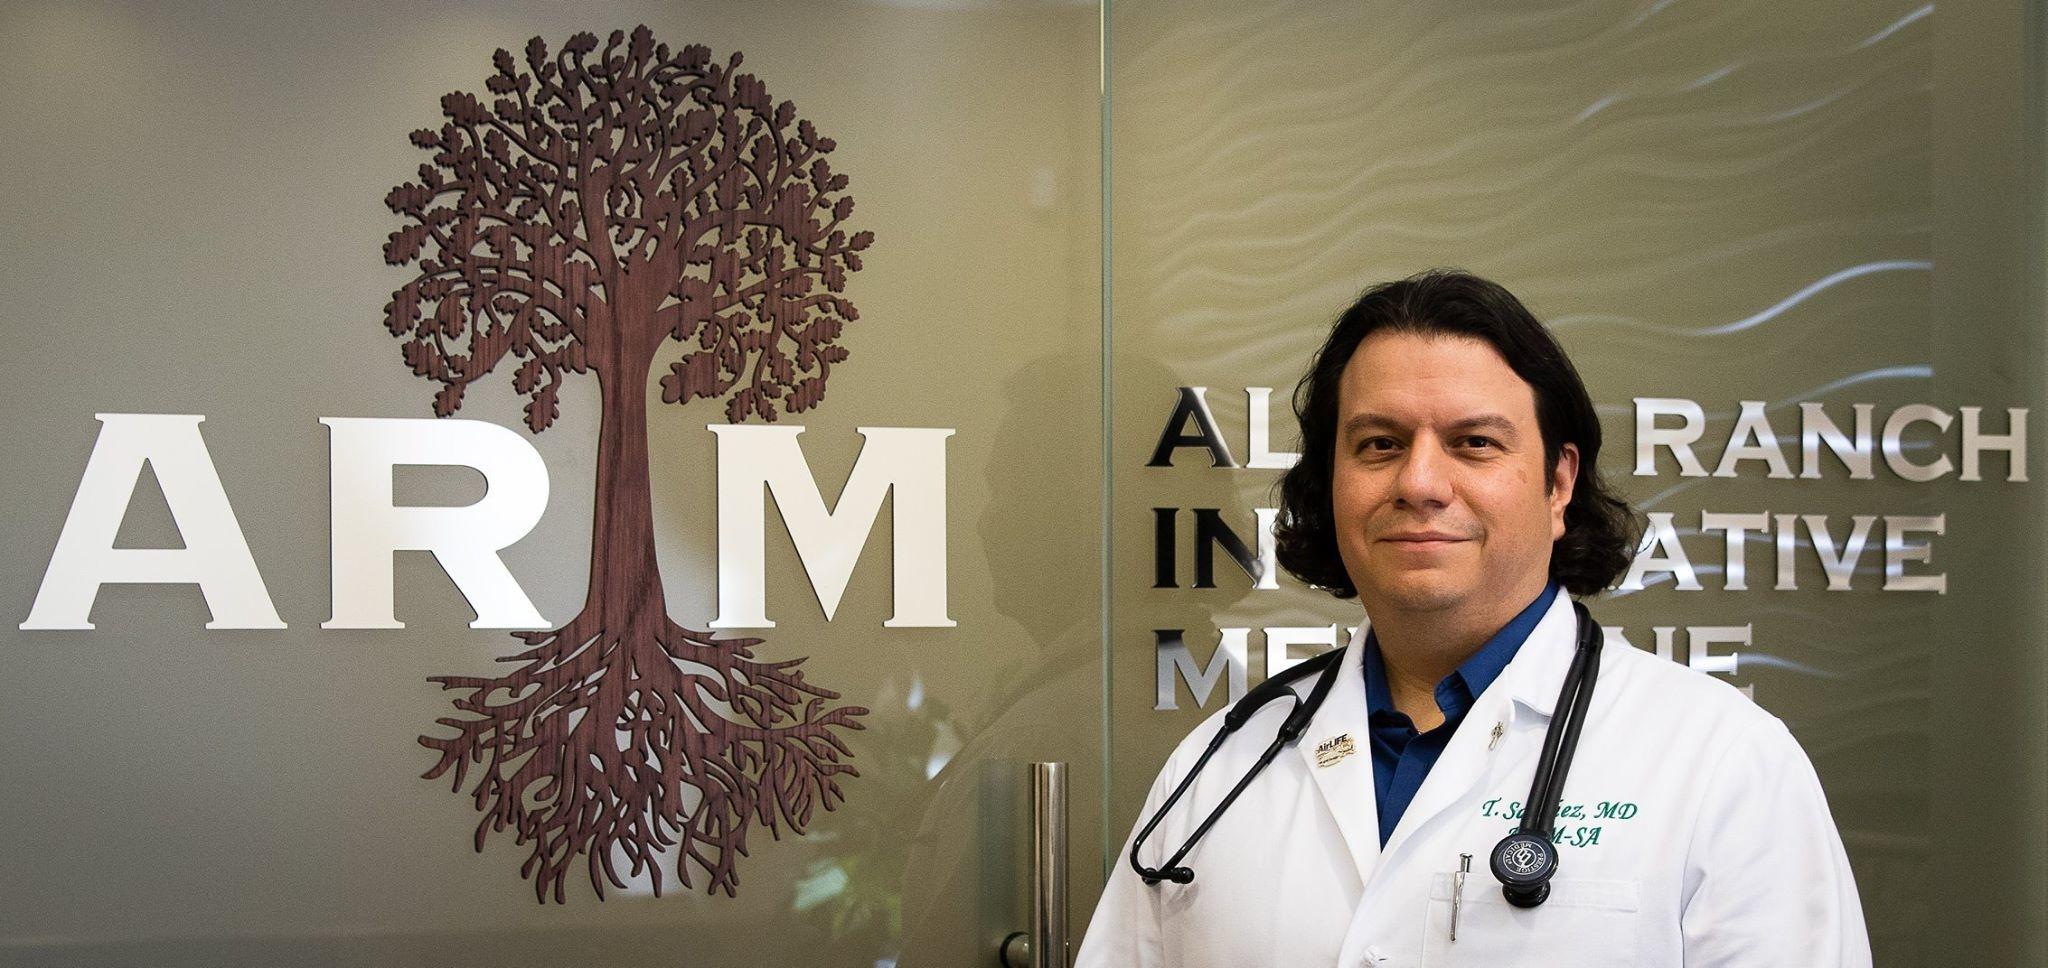 Alamo Ranch Integrative Medicine image 12